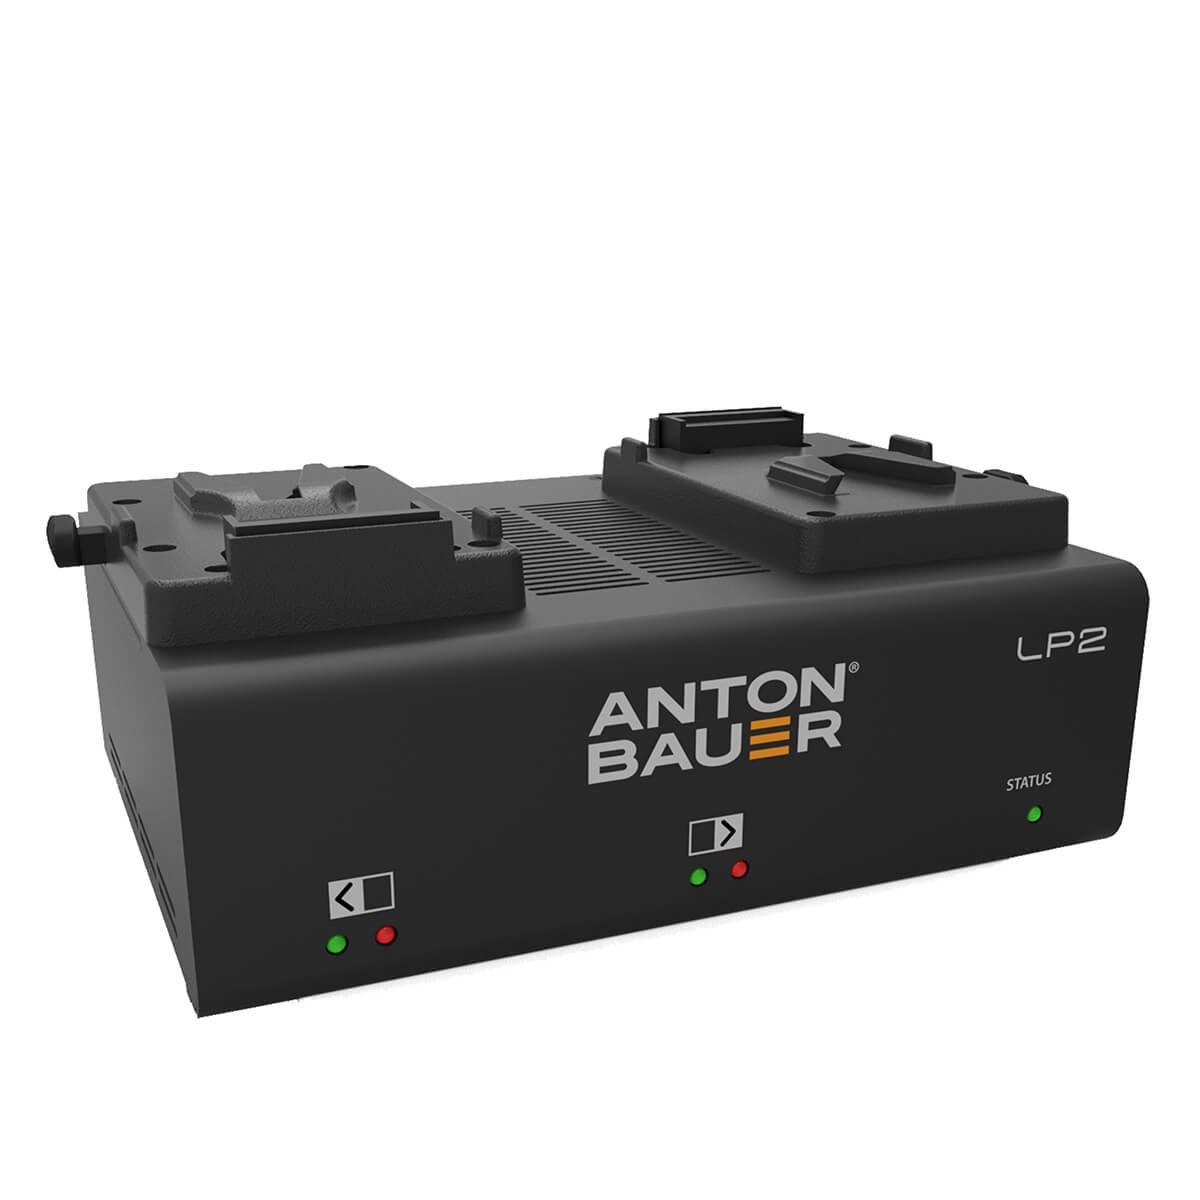 Anton Bauer lp2低プロファイルデュアルV -マウントpriority-based同時2-positionバッテリーPowercharger with LED表示   B00VJCCECA